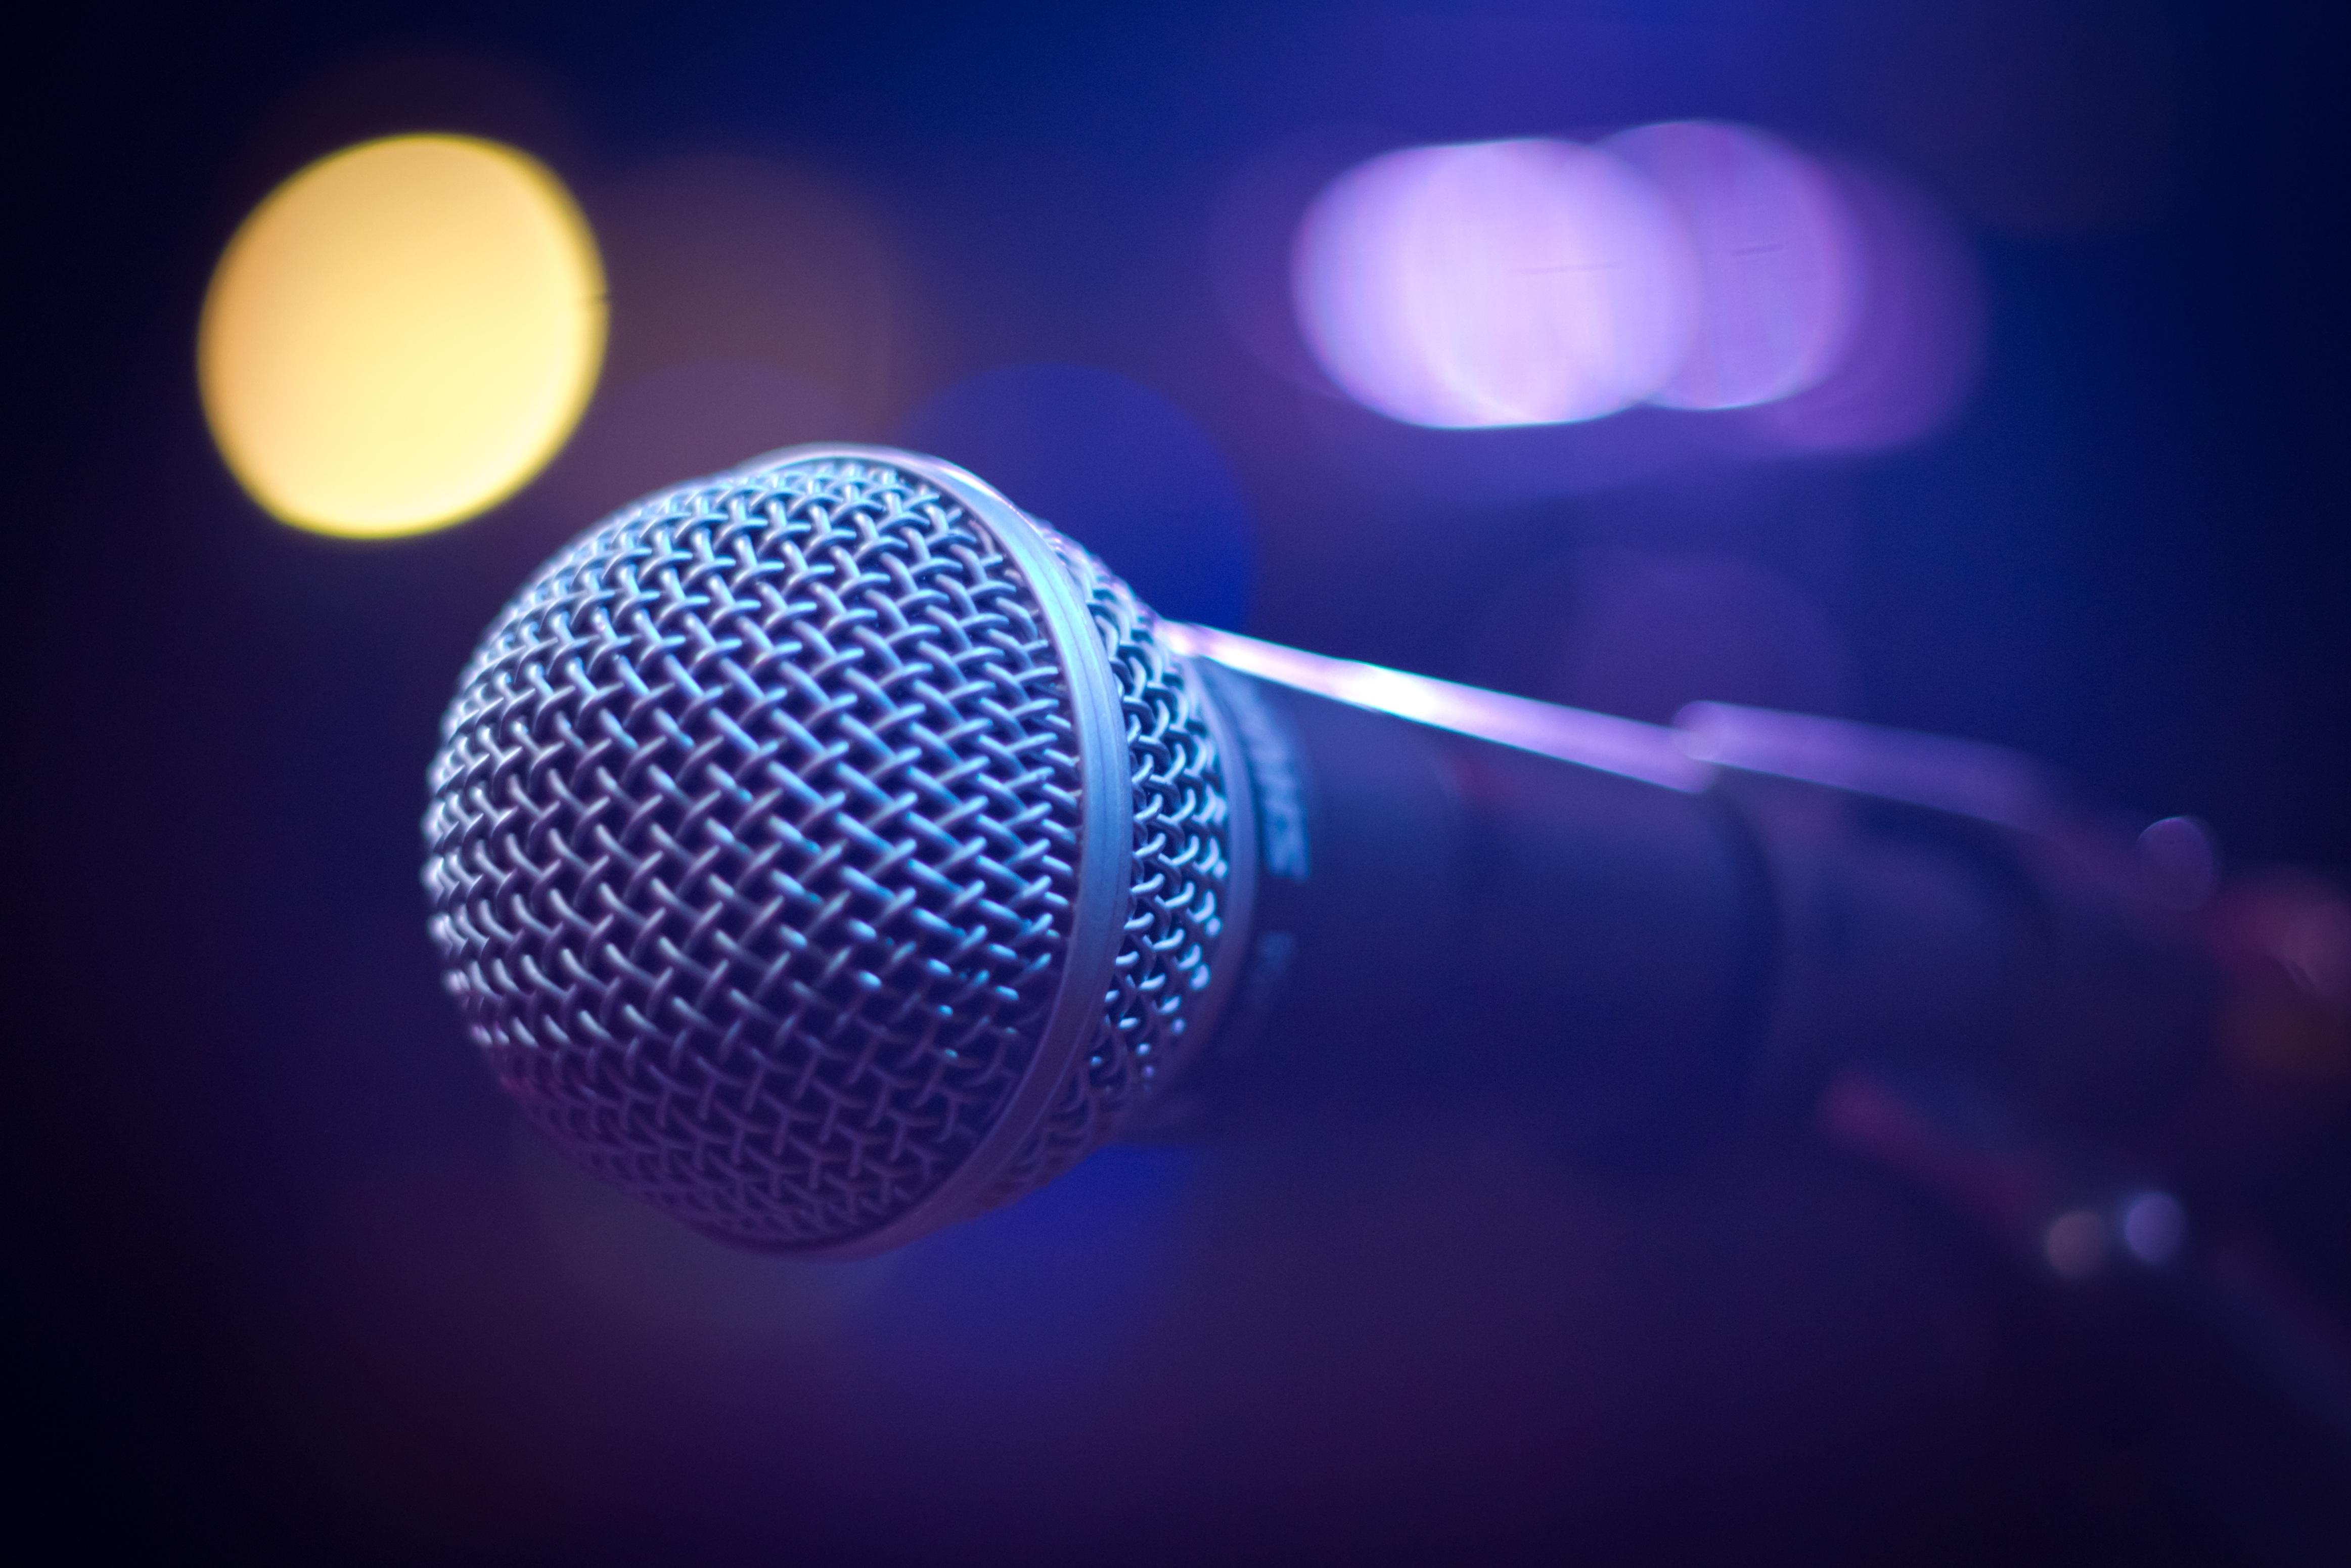 Popular Wallpaper Blue Music - music-light-technology-microphone-blue-lighting-audio-sound-audio-equipment-computer-wallpaper-electronic-device-813211  Pictures_4097100.jpg